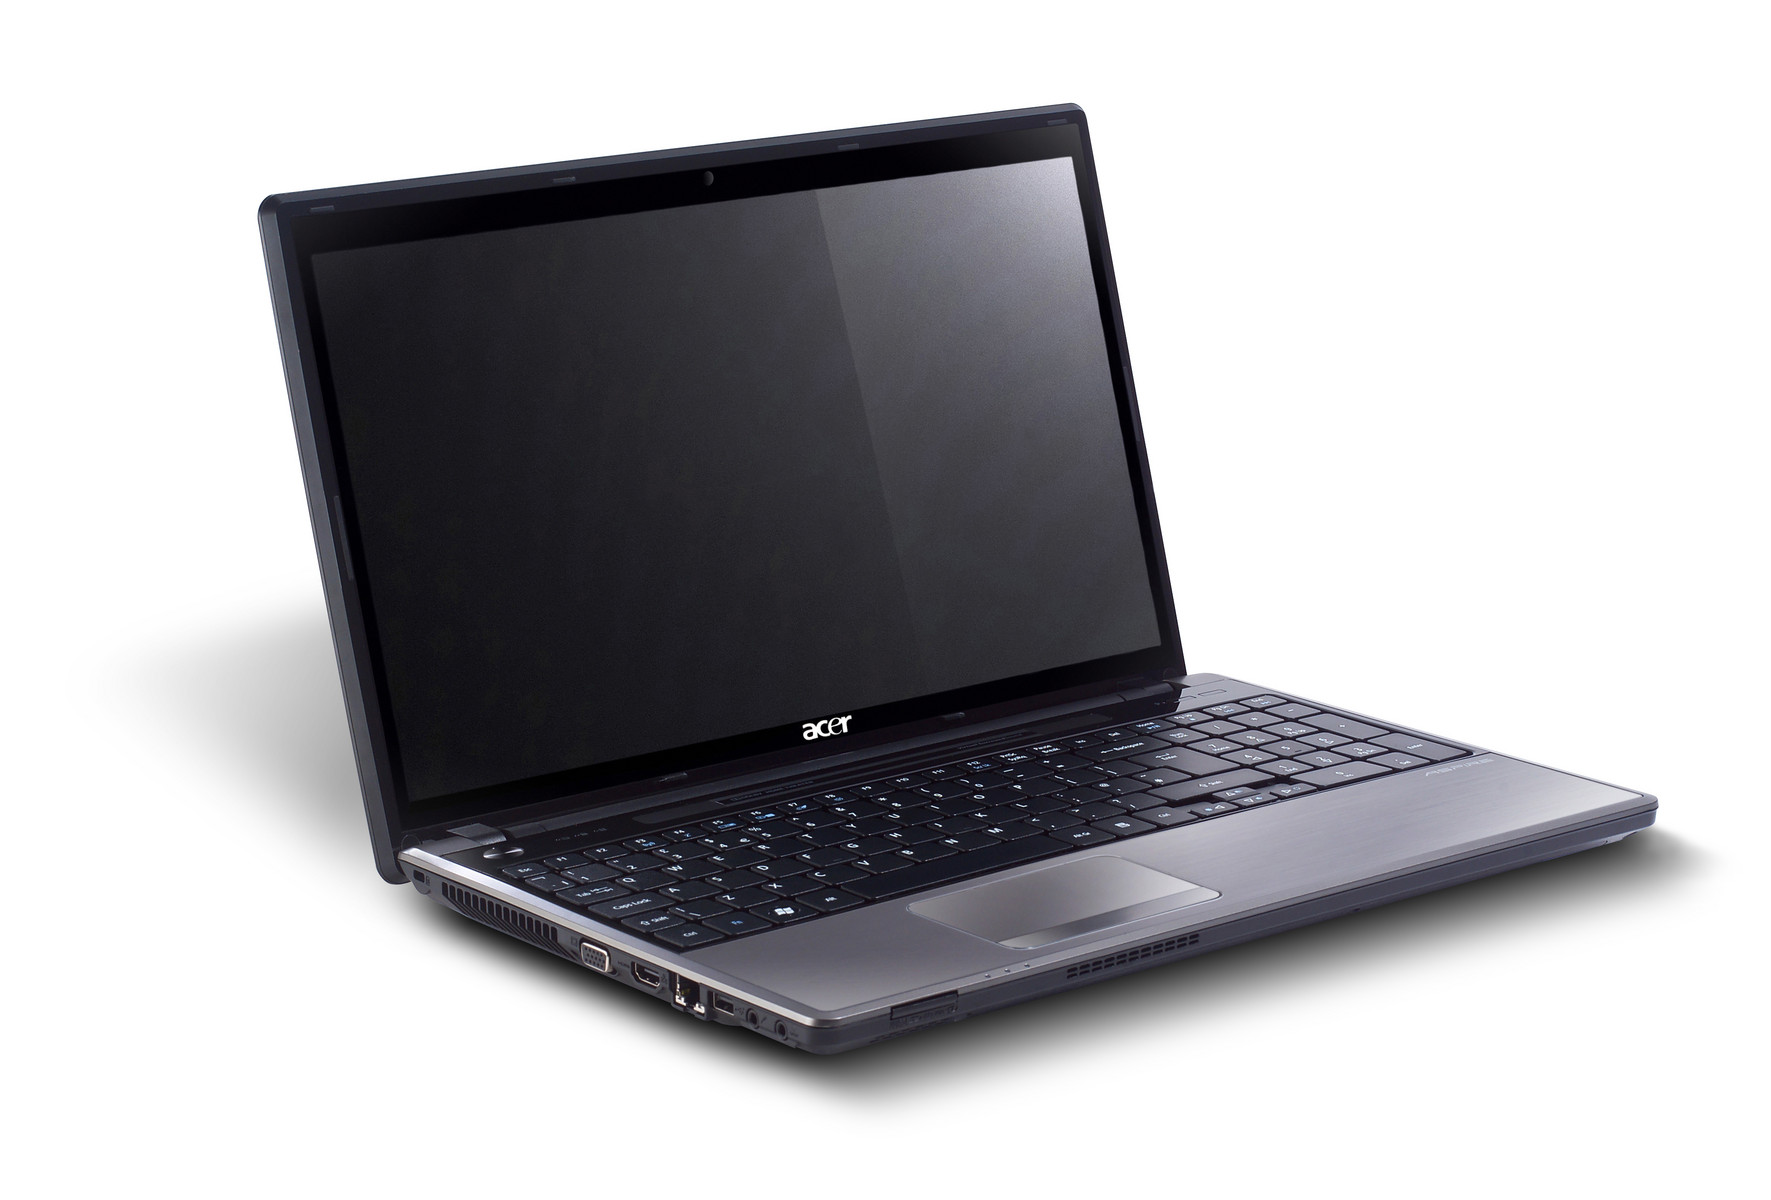 Acer Aspire 5745G Intel Turbo Boost 64 Bit